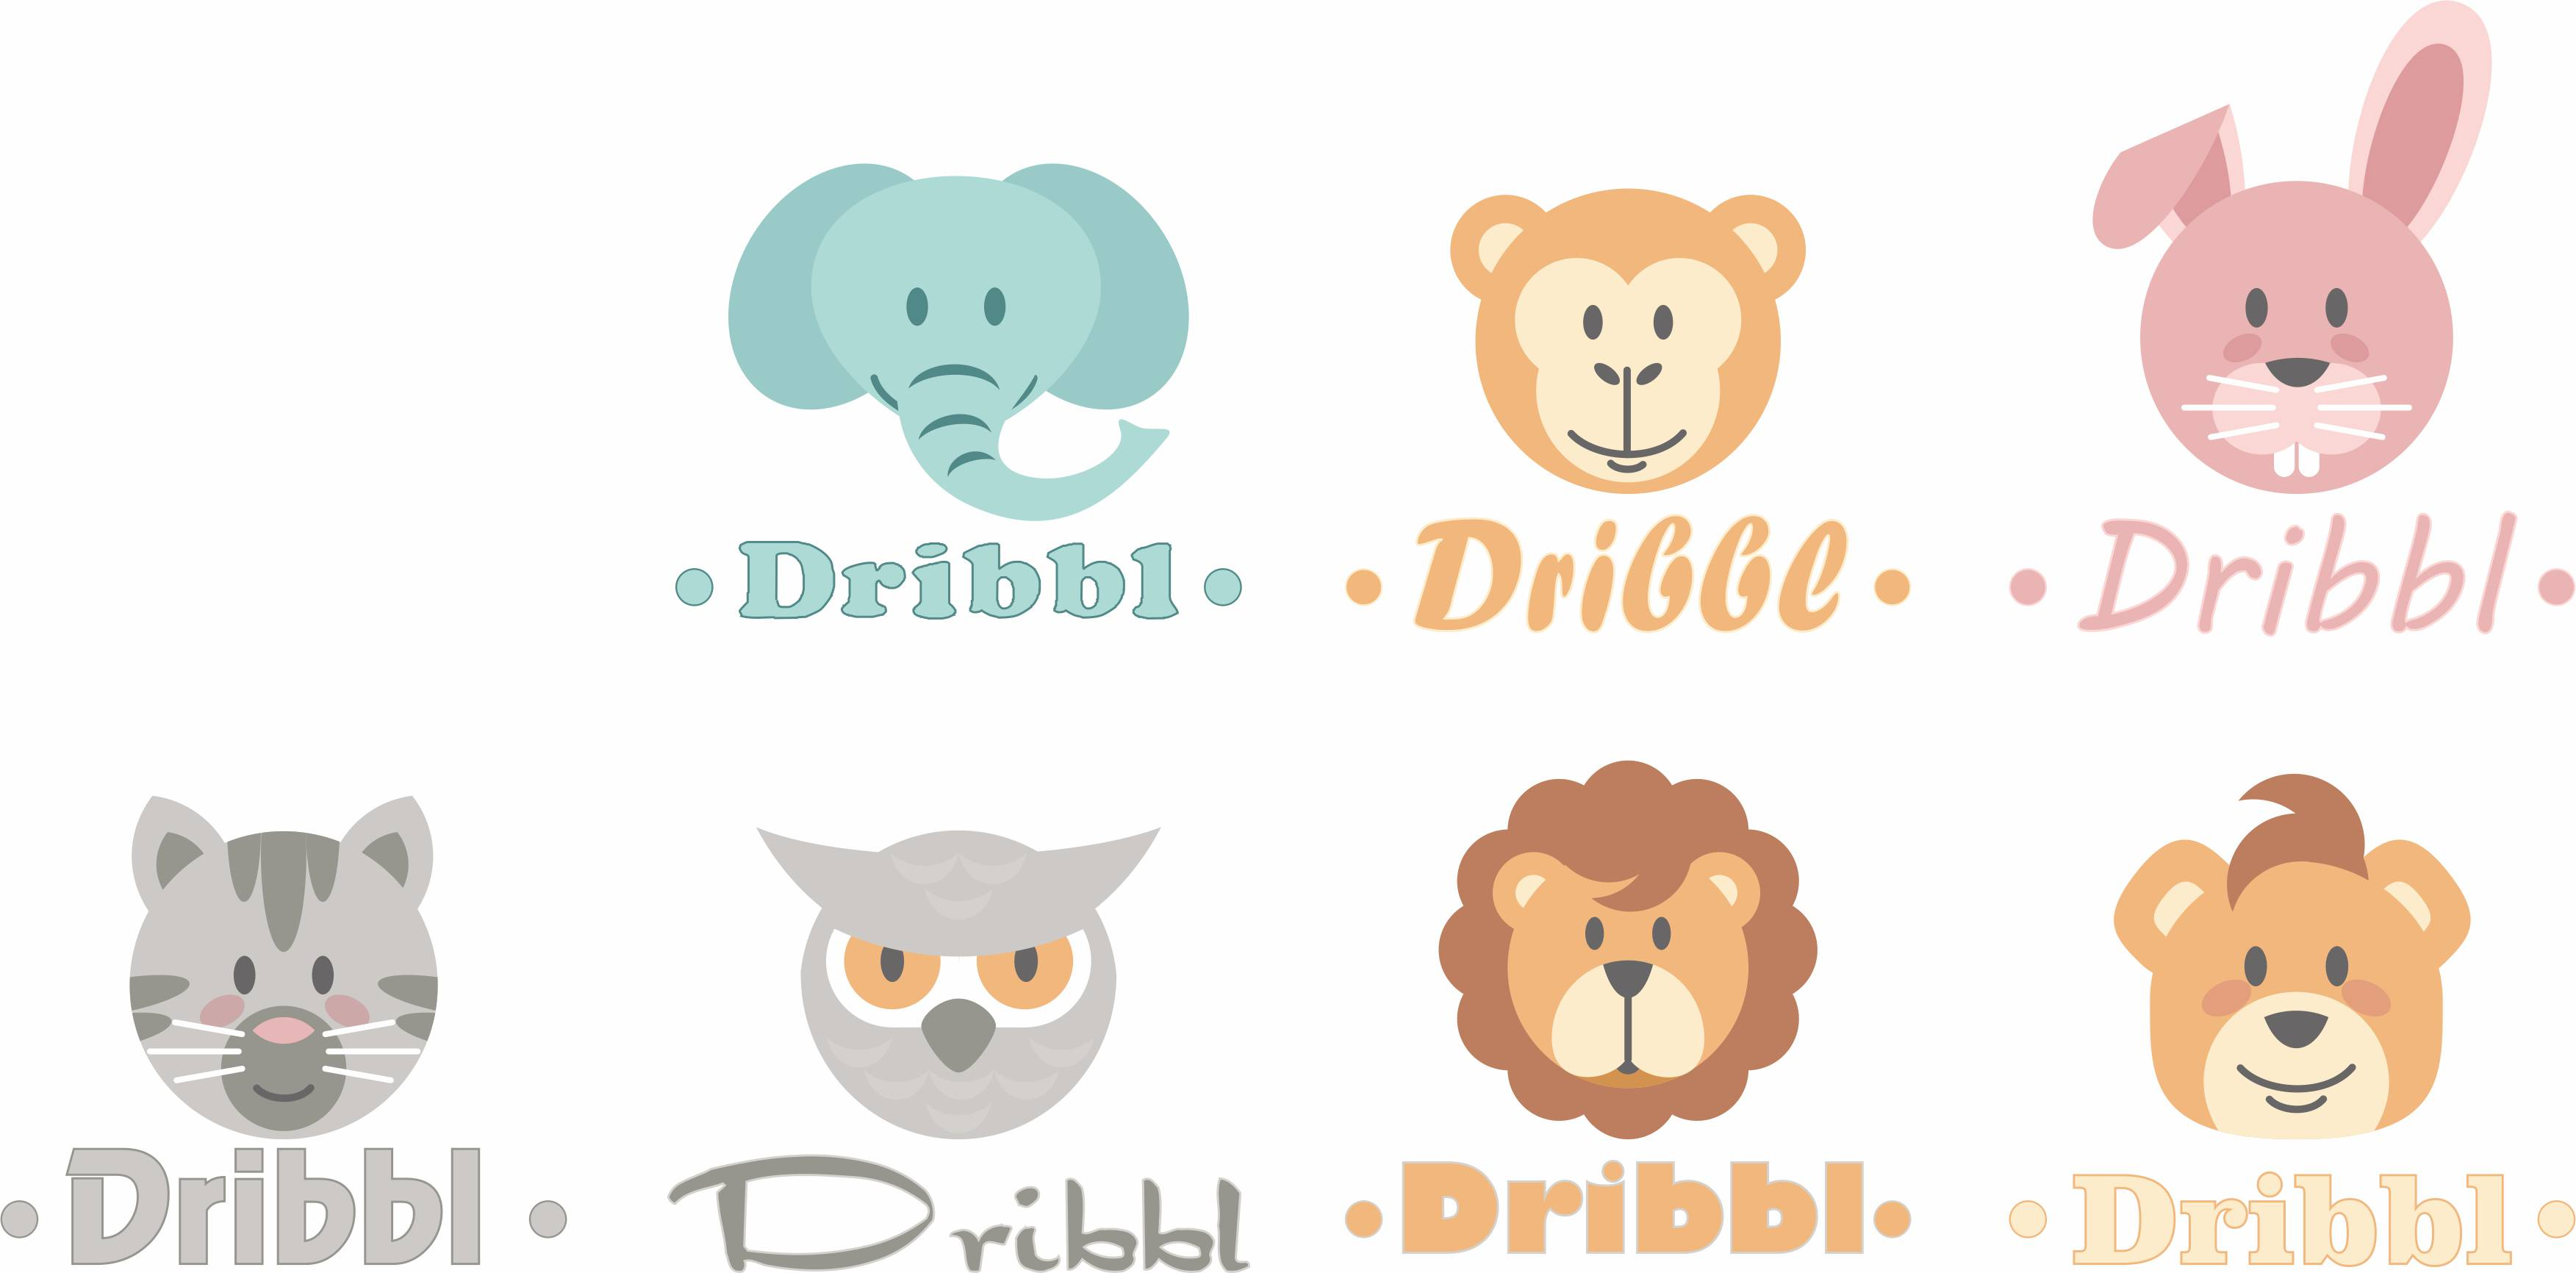 Разработка логотипа для сайта Dribbl.ru фото f_8585a9c3790b48c8.jpg